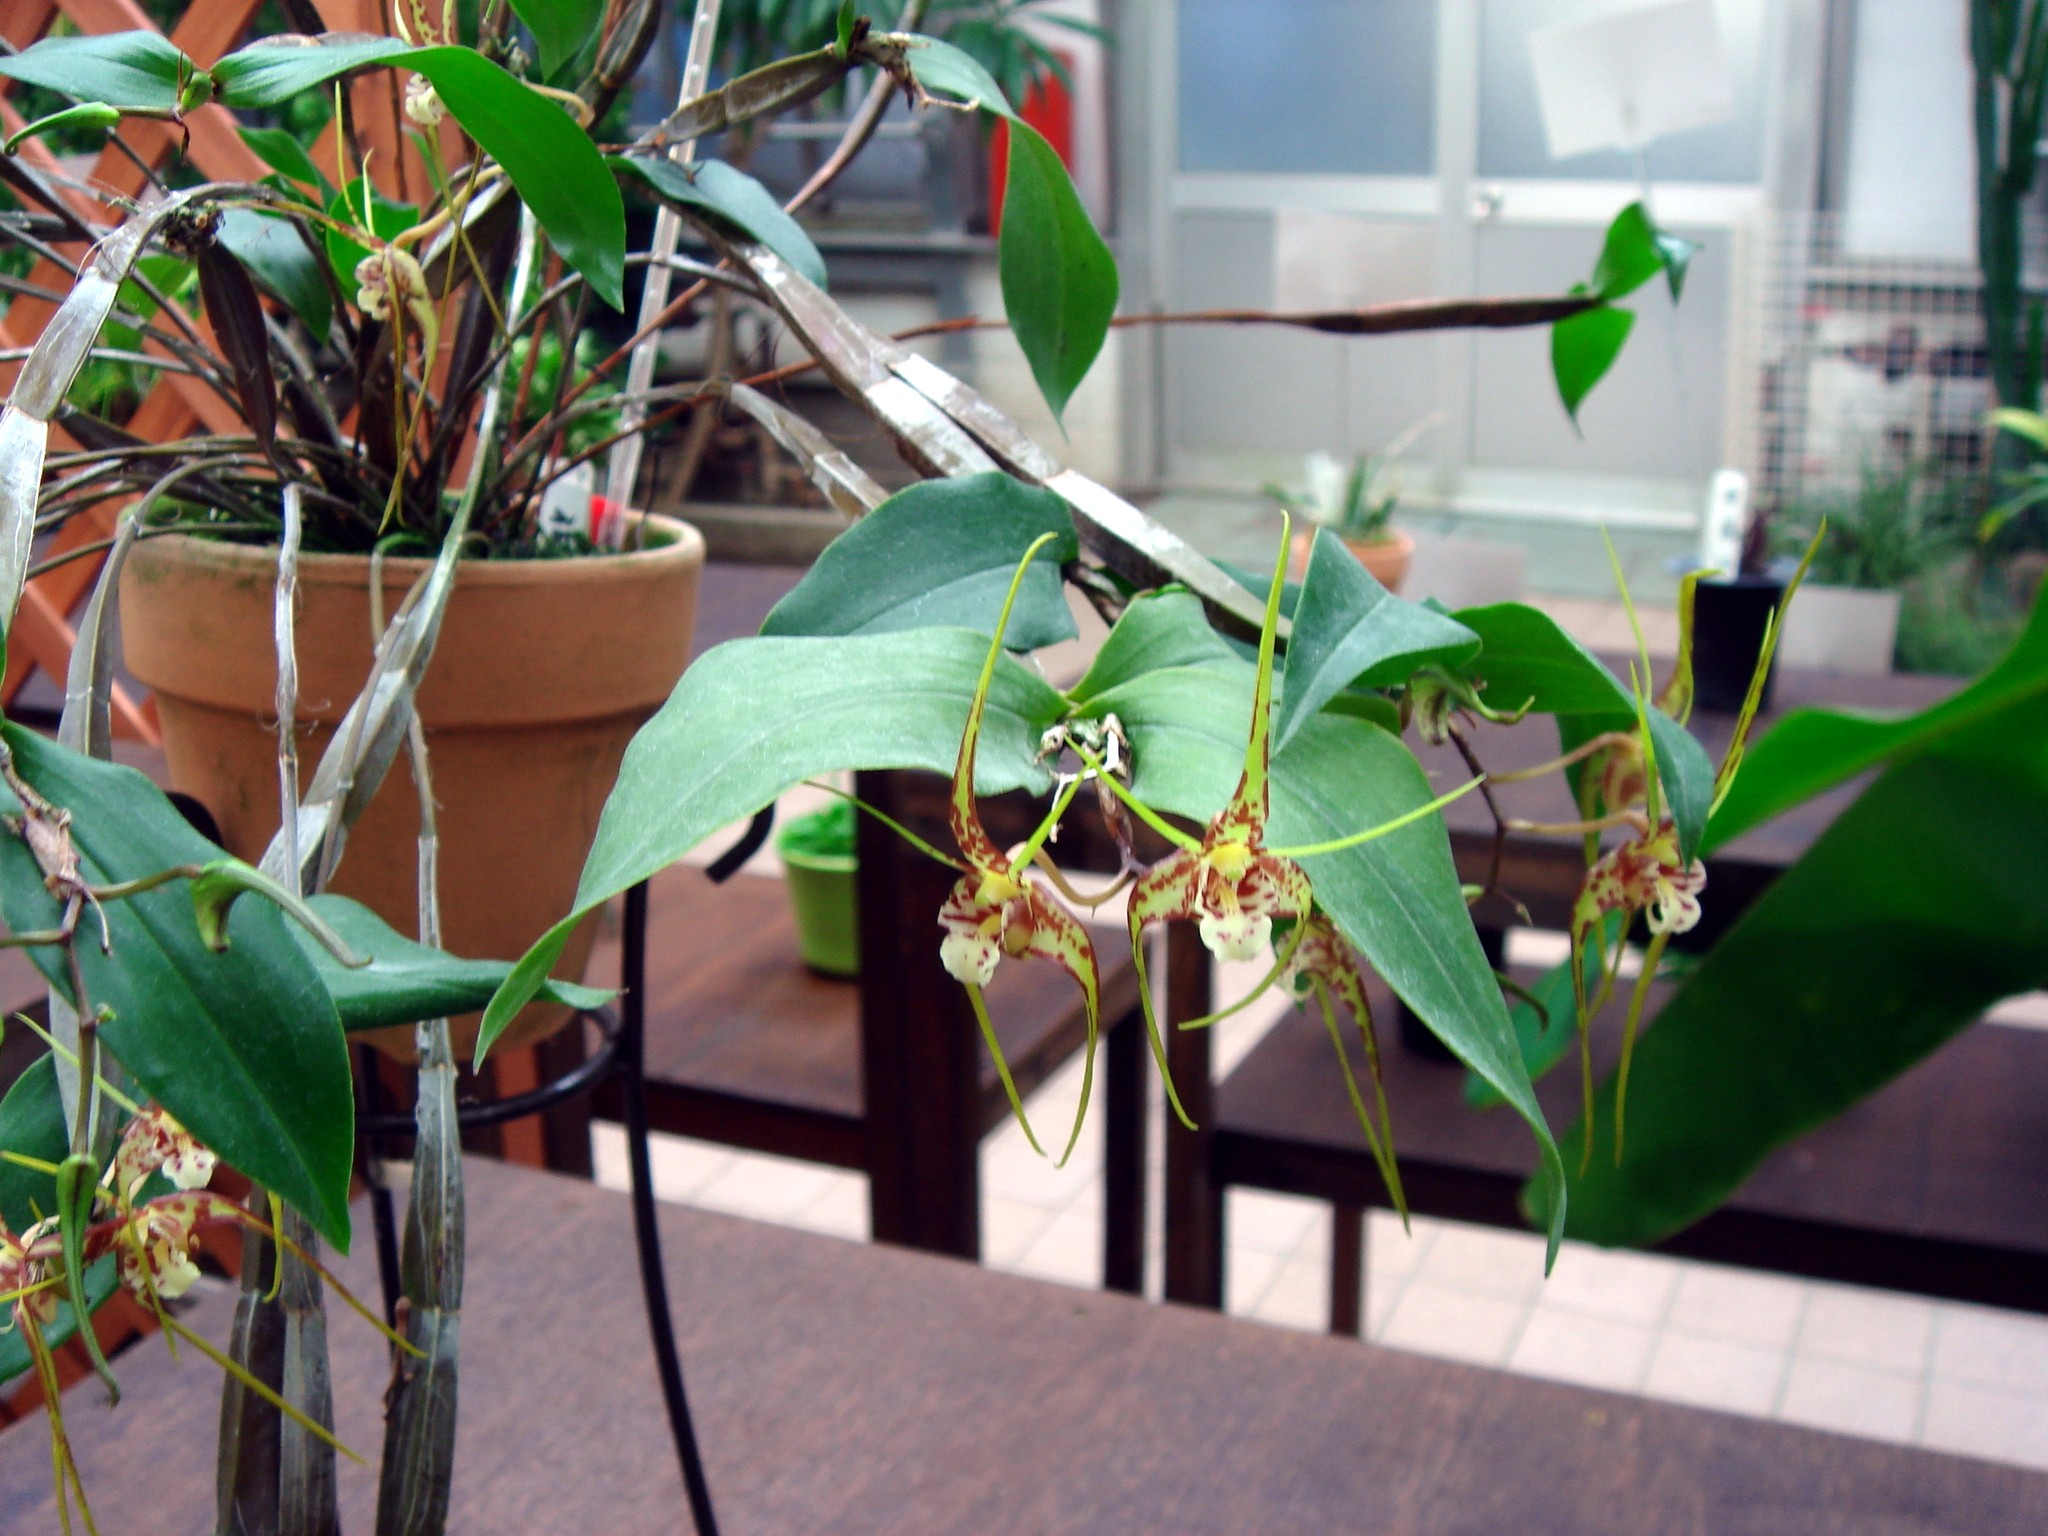 http://orchids.la.coocan.jp/Dendrobium/Dendrobium%20tetragonum%20giganteum/DSC04107.JPG